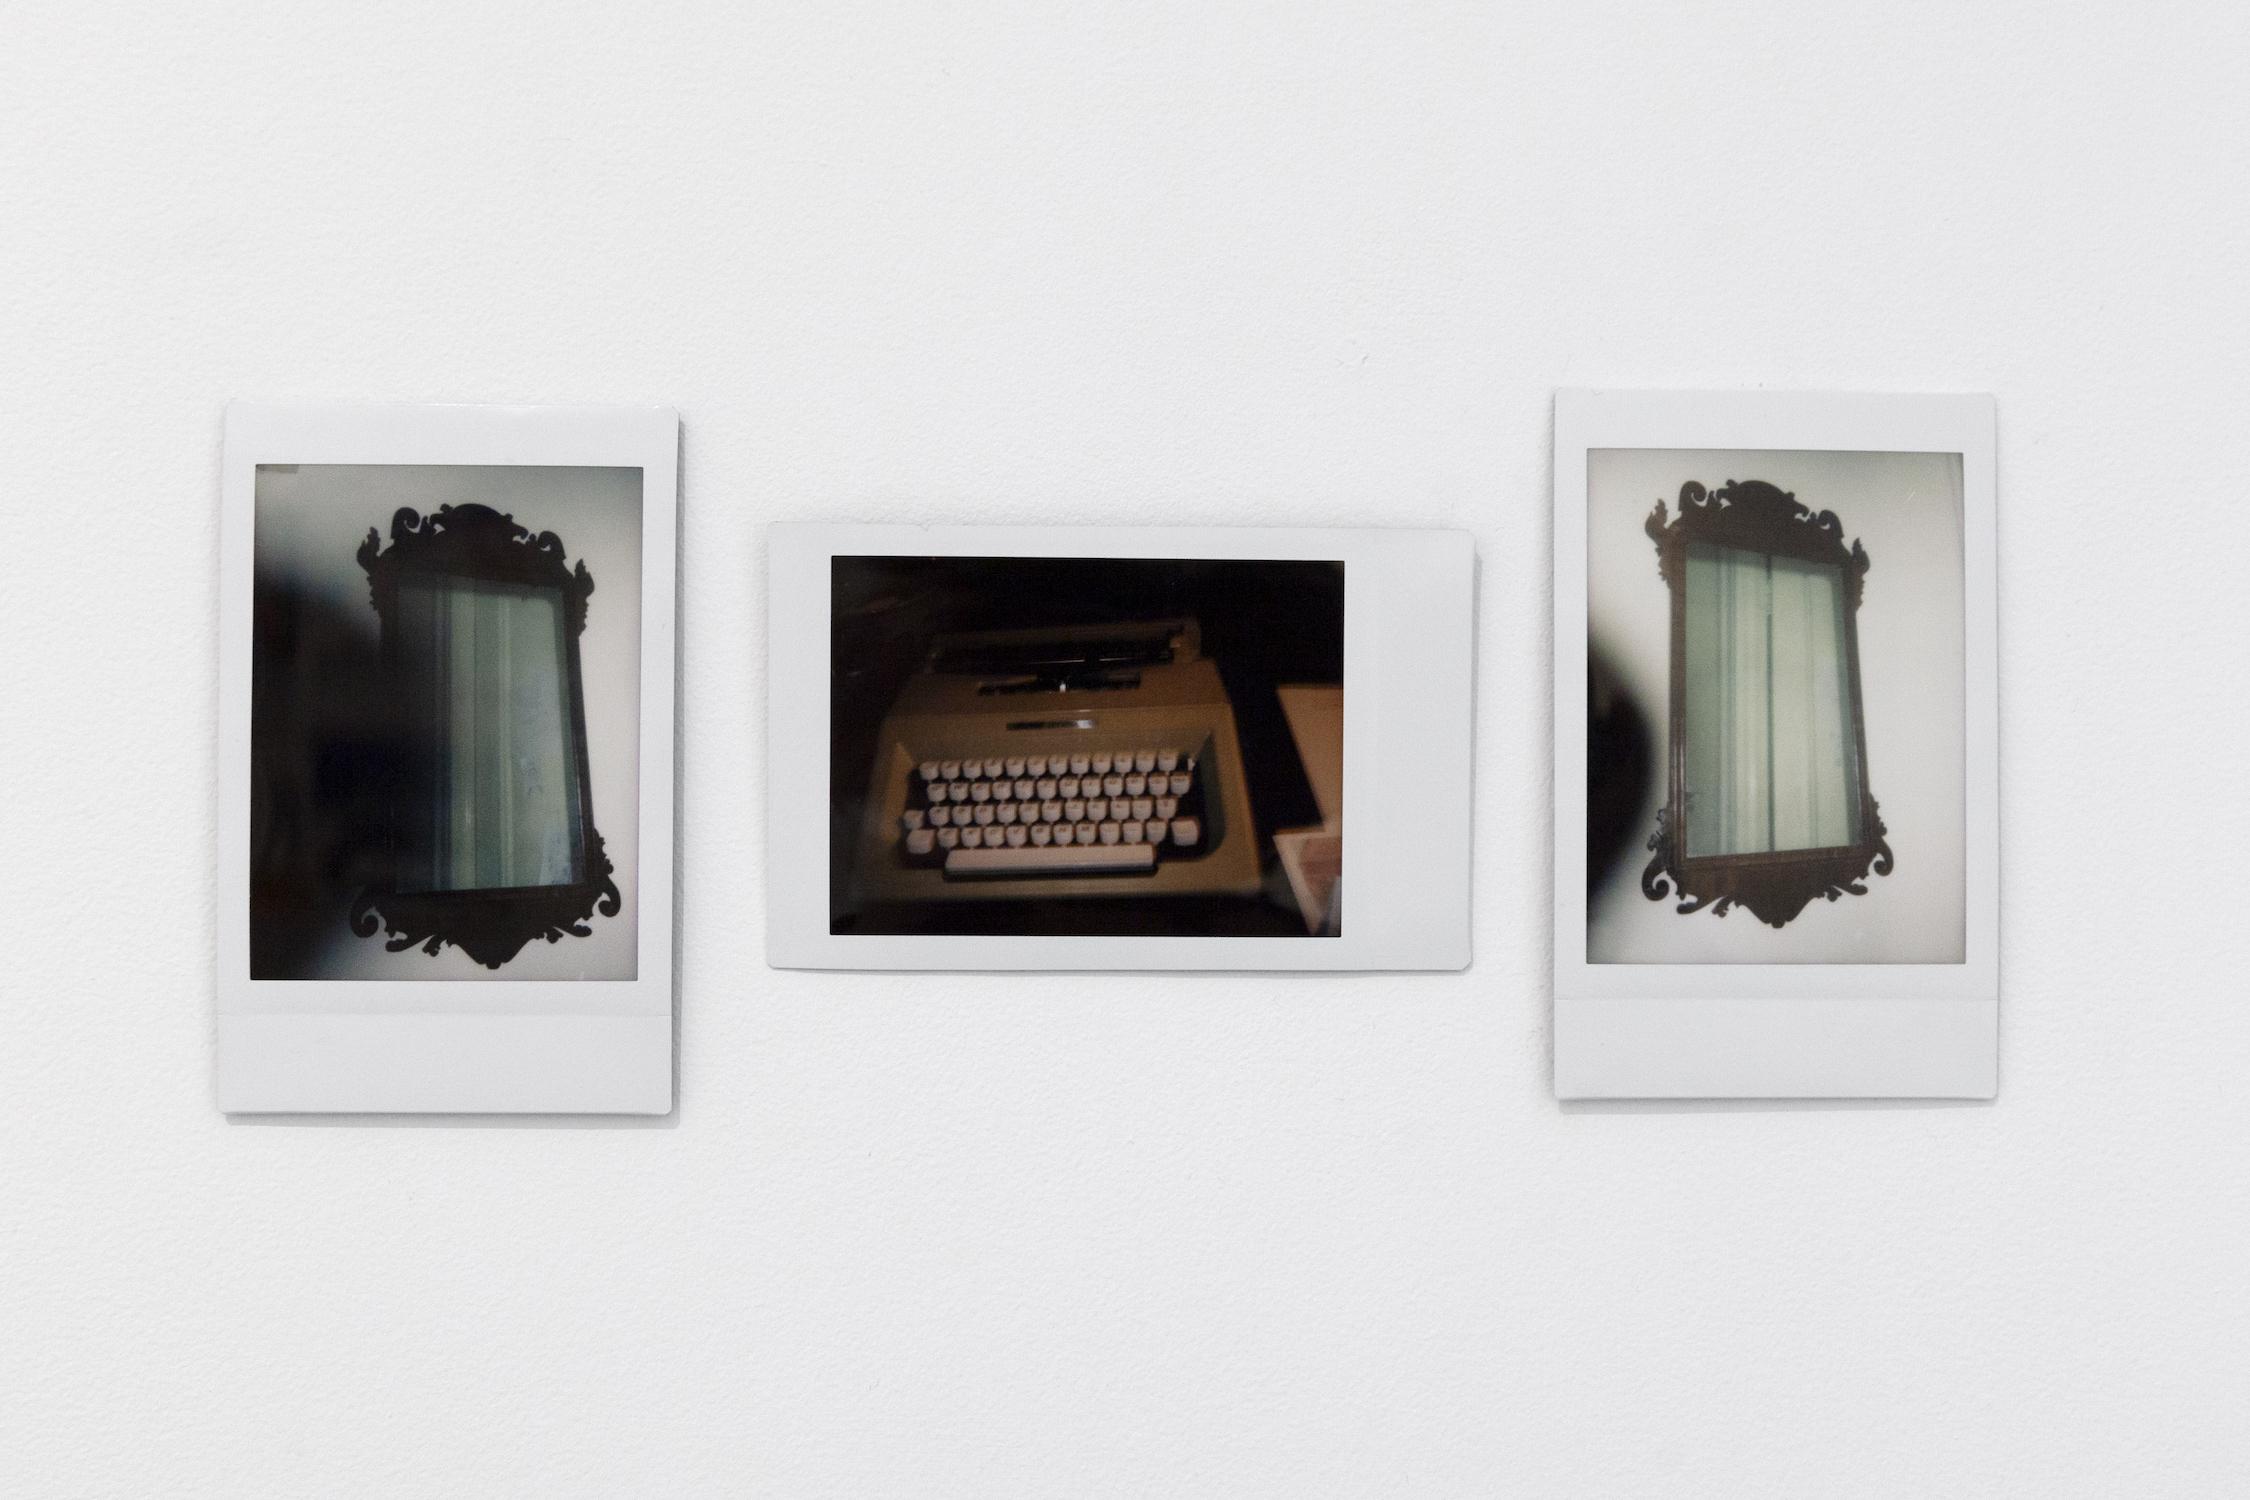 Julian Remmel,  Ghost , 2018, Polaroid print triptych, 3.39 x 2.13 inches each (8.61 x 5.41 cm)